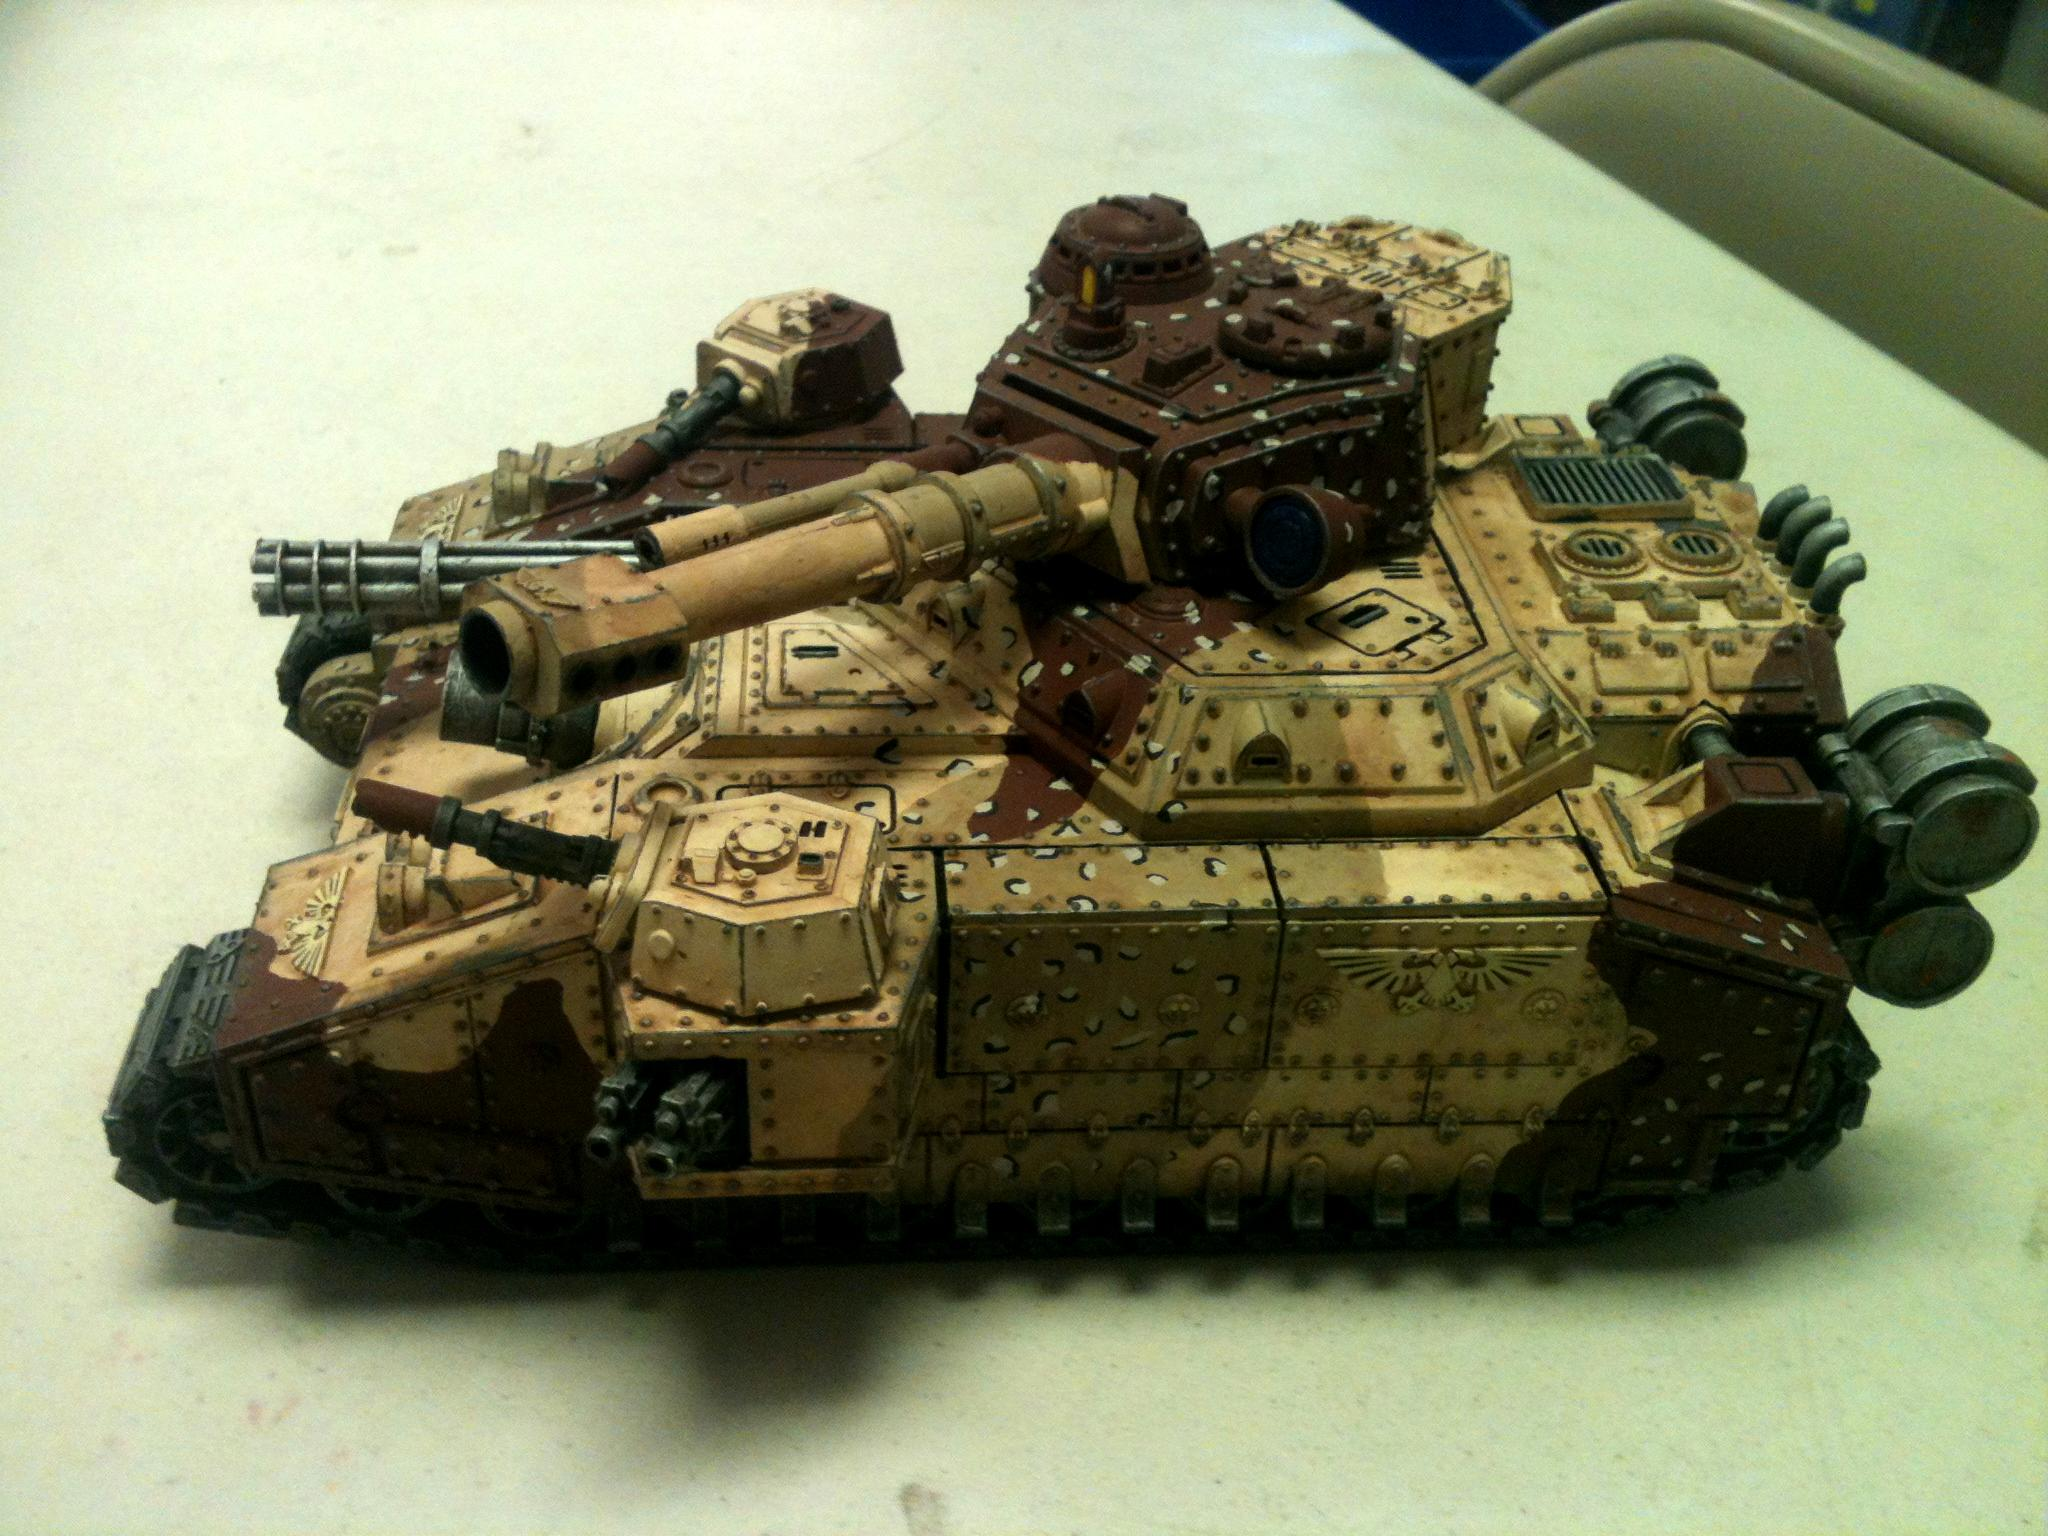 Baneblade, Imperial Guard, Warhammer 40,000